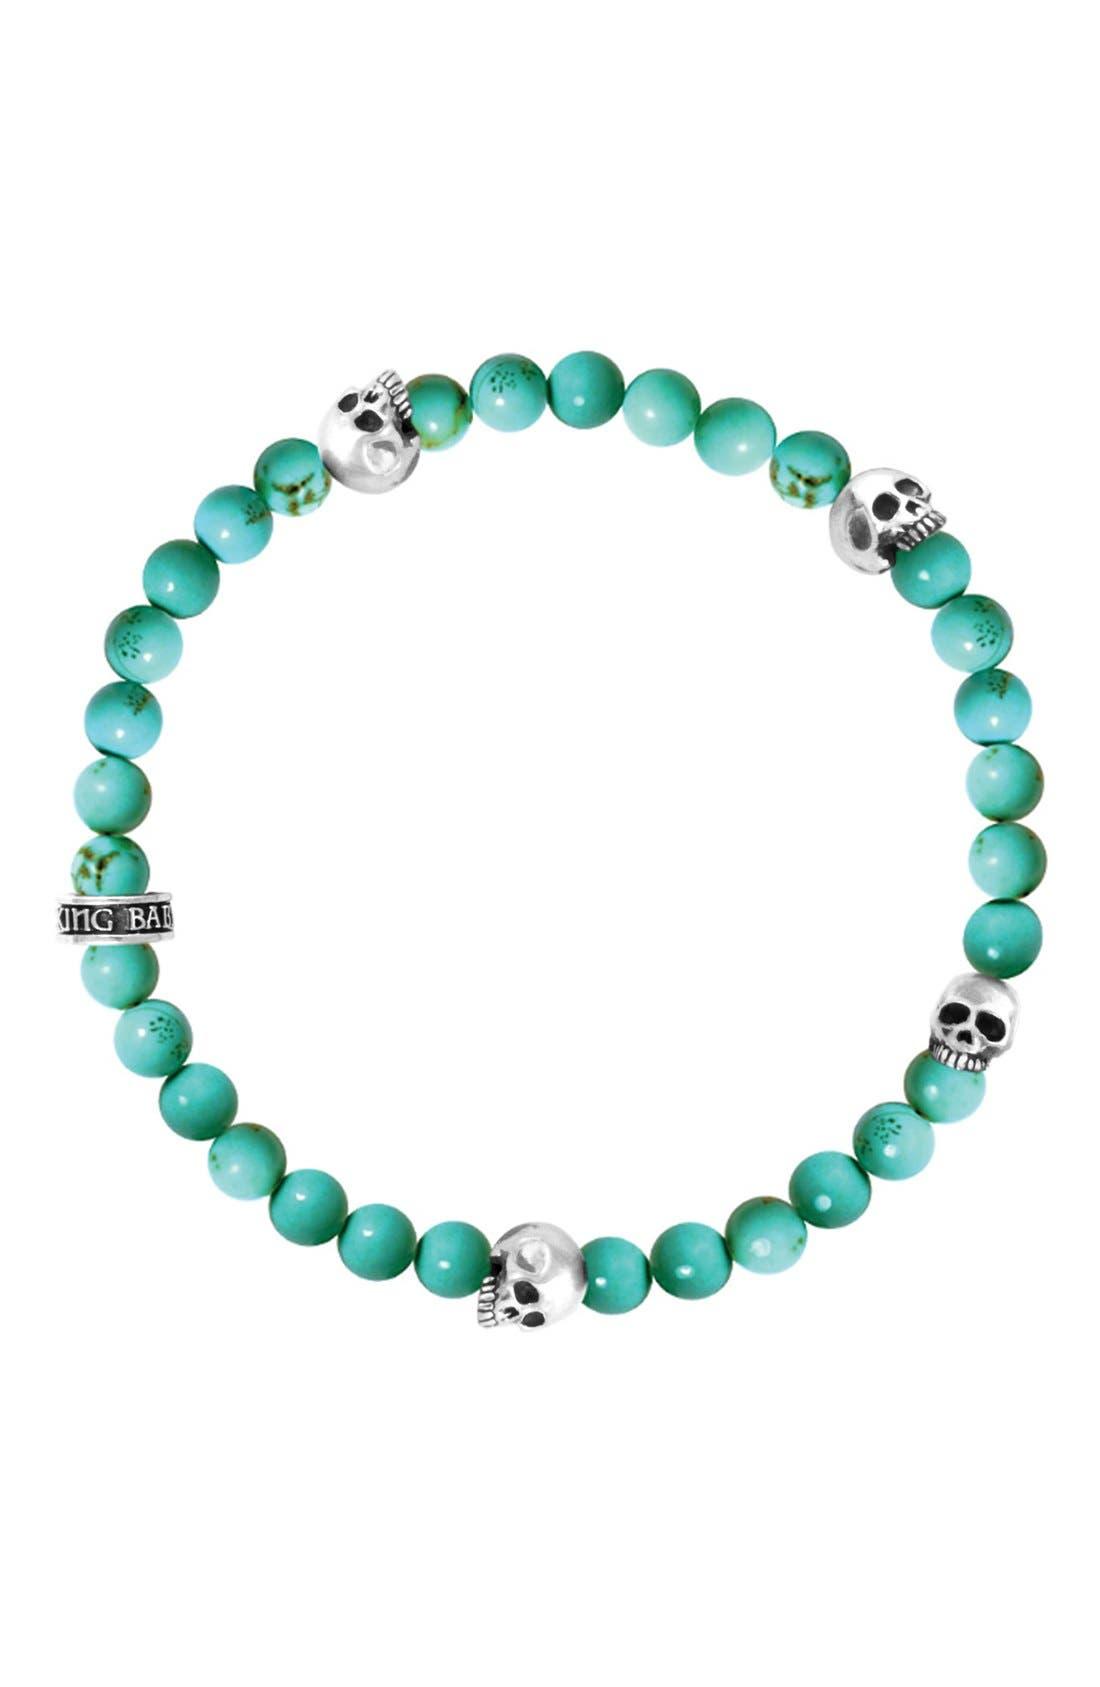 King Baby Turquoise Bead Bracelet